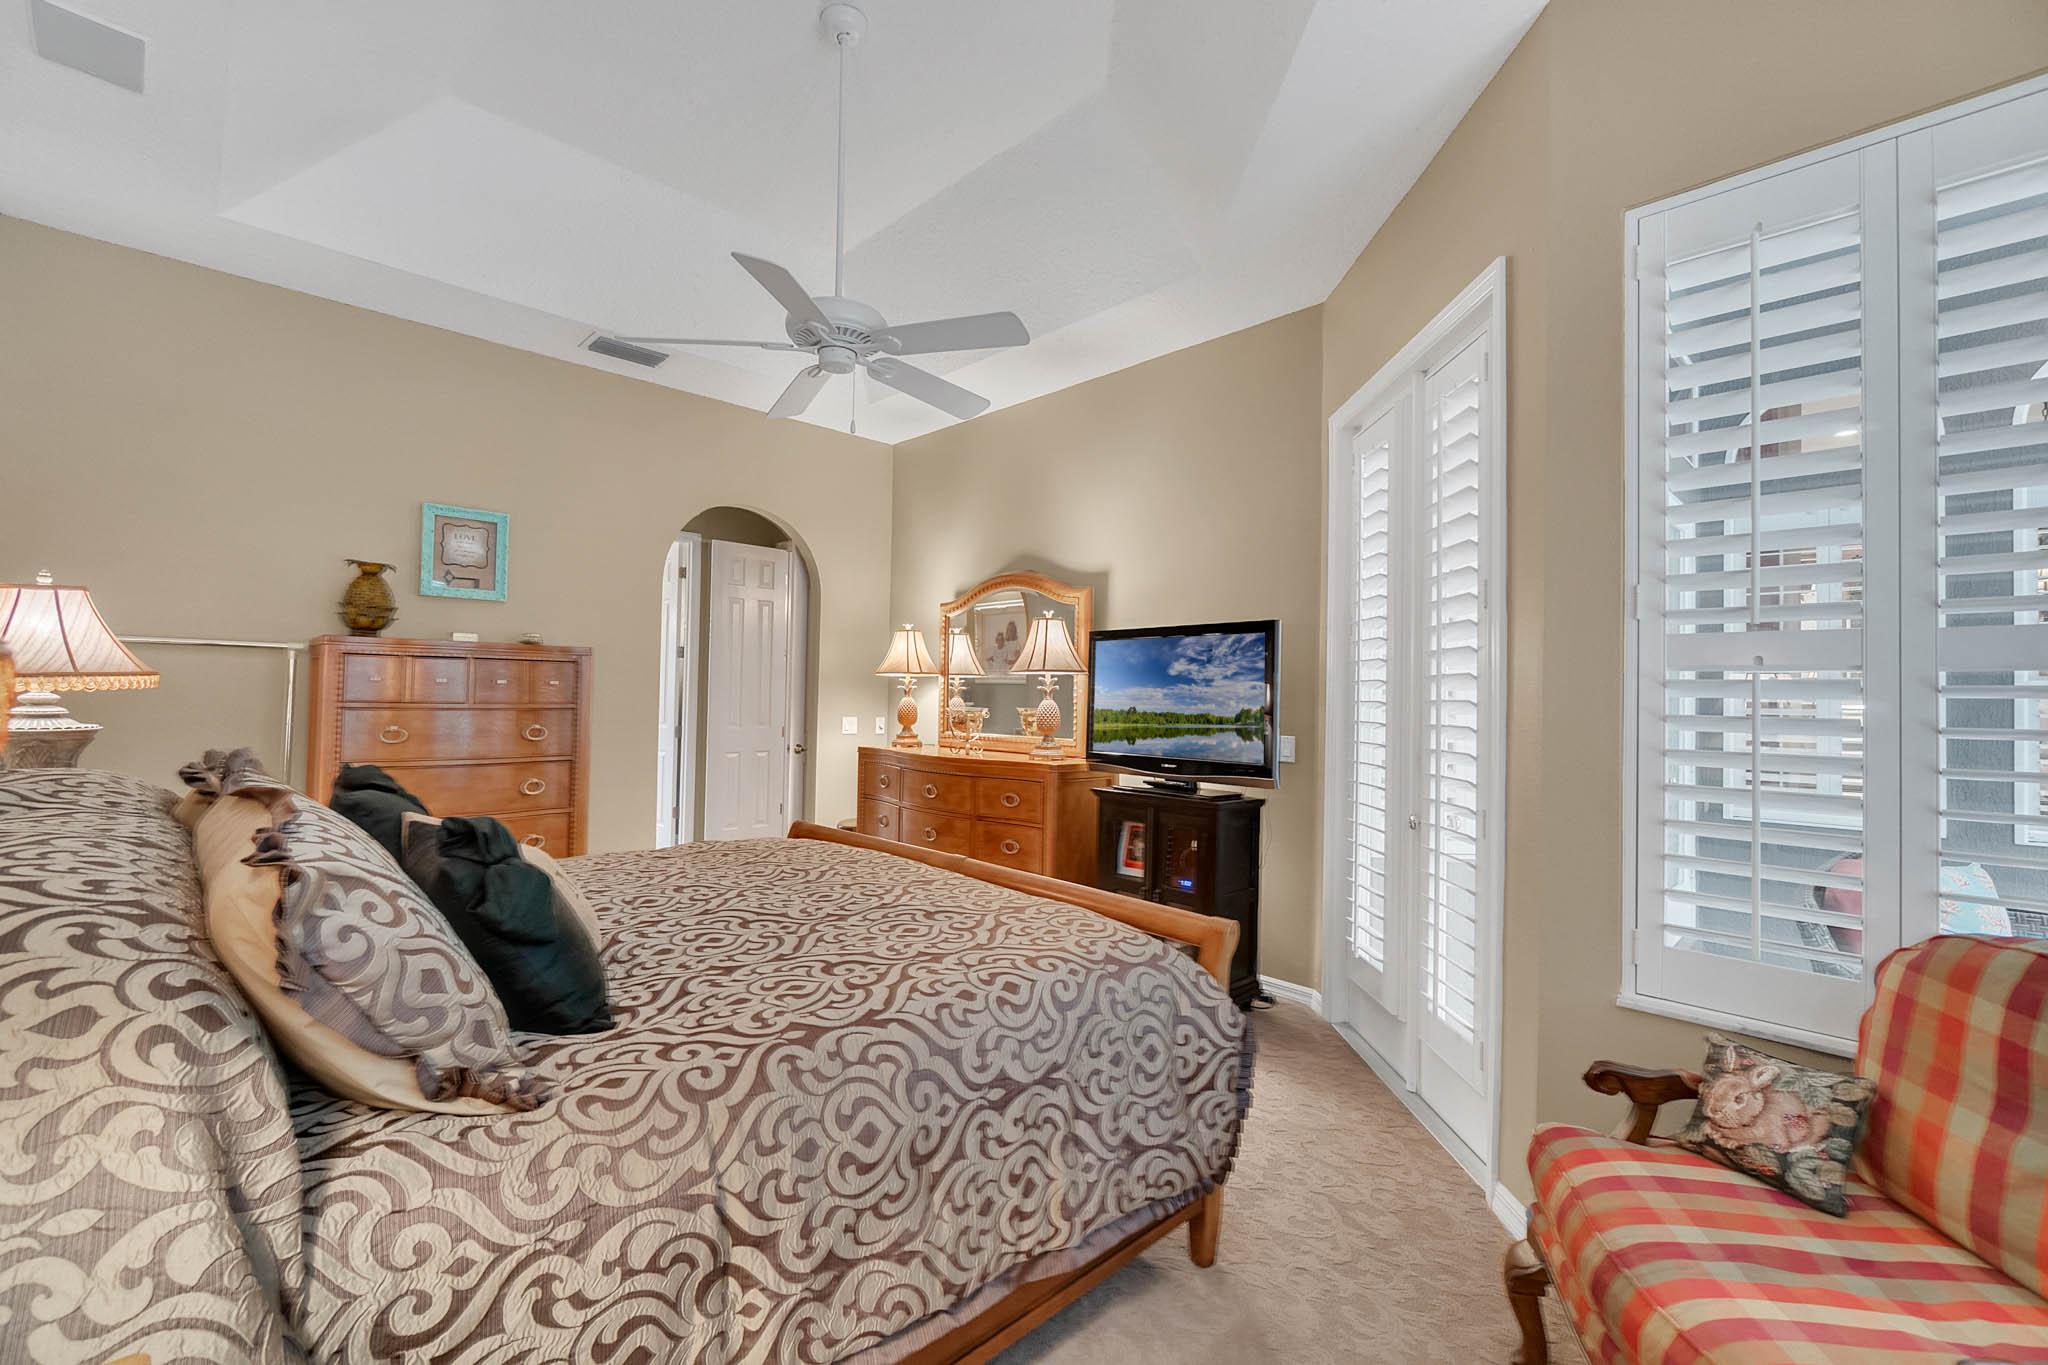 429-Fawn-Hill-Pl--Sanford--FL-32771----26---Master-Bedroom.jpg